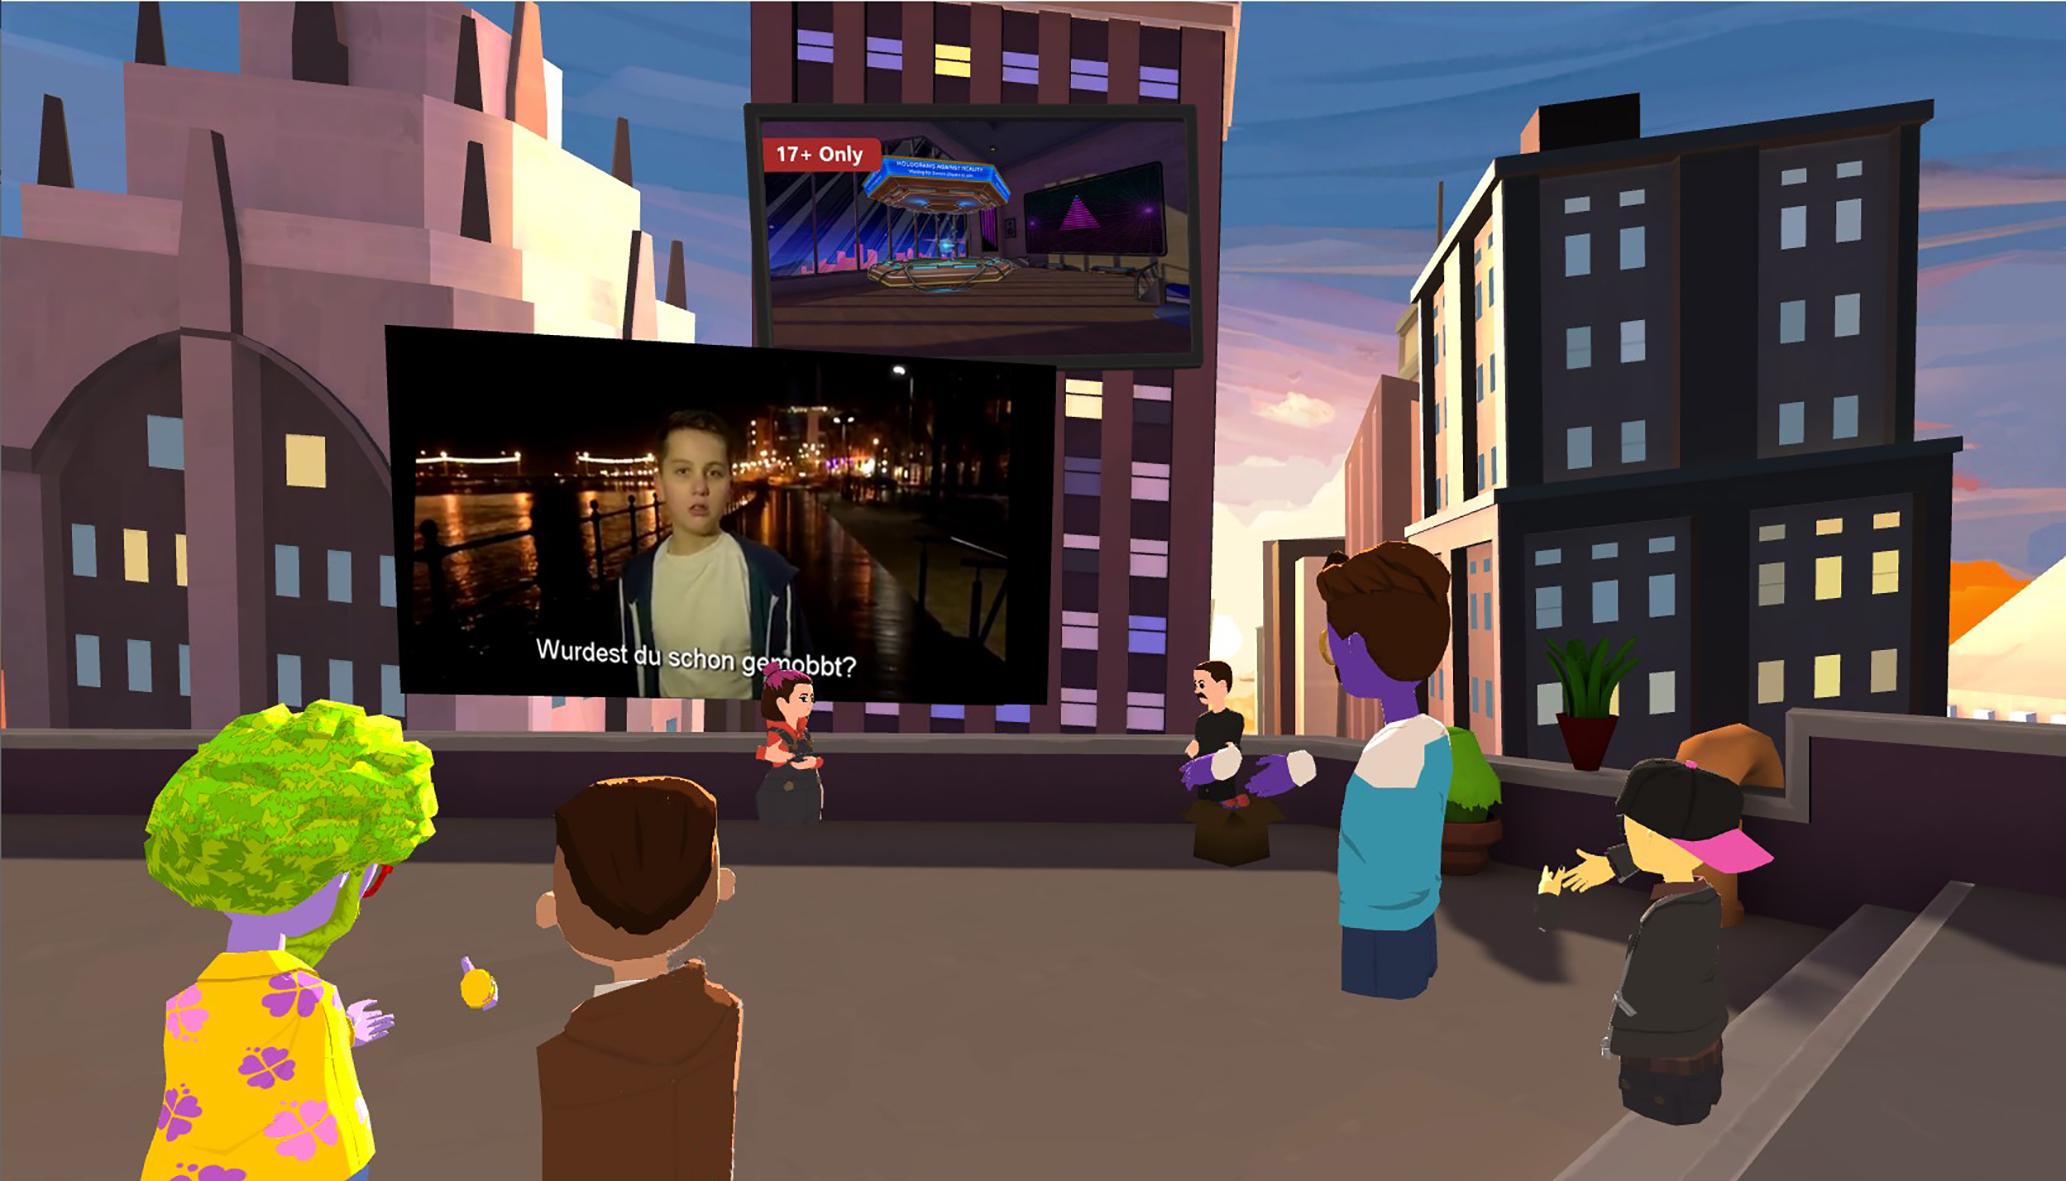 Virtueller Jugendtreff, Szene aus Microsoft Altspace VR